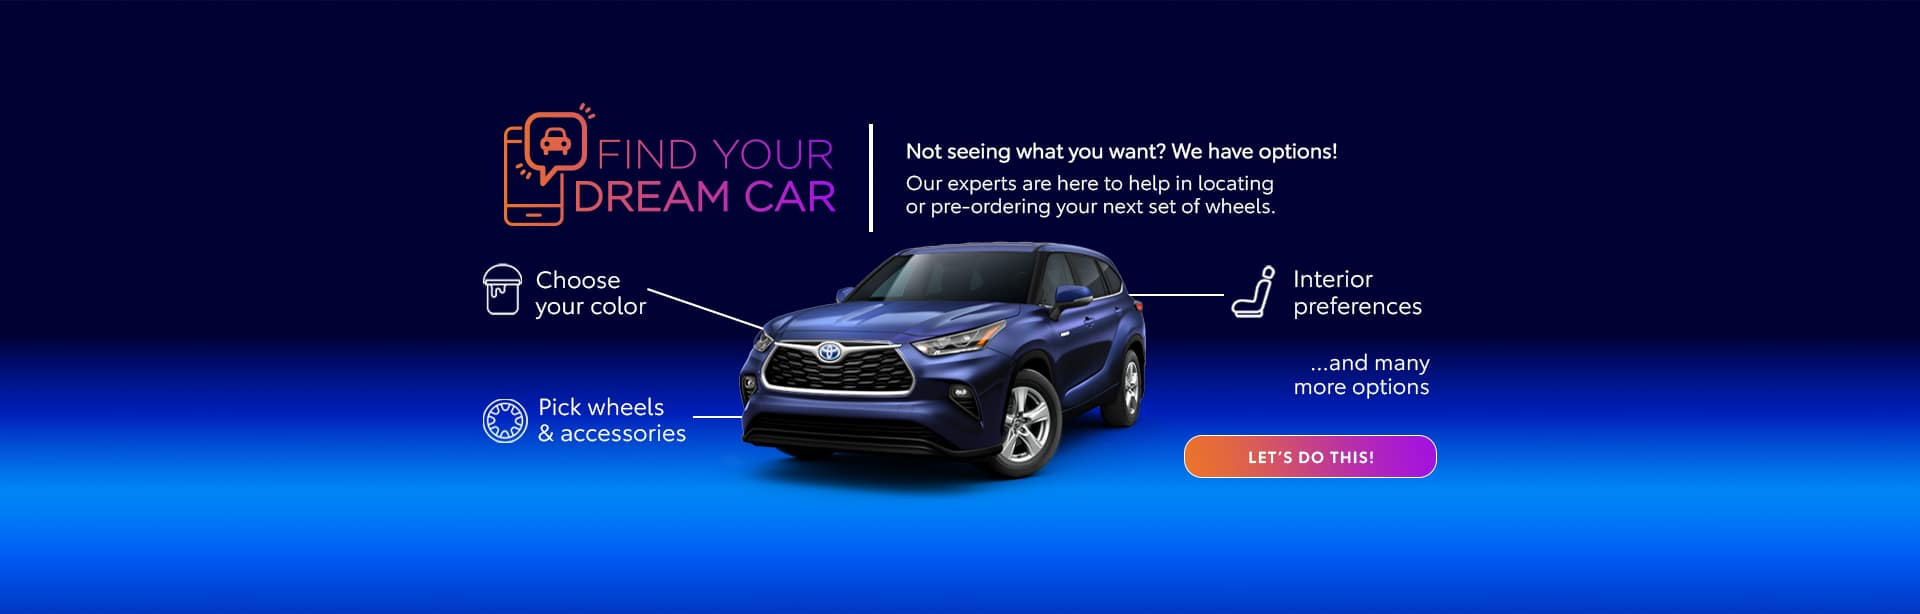 Holman Toyota Pre-Order Dream Car